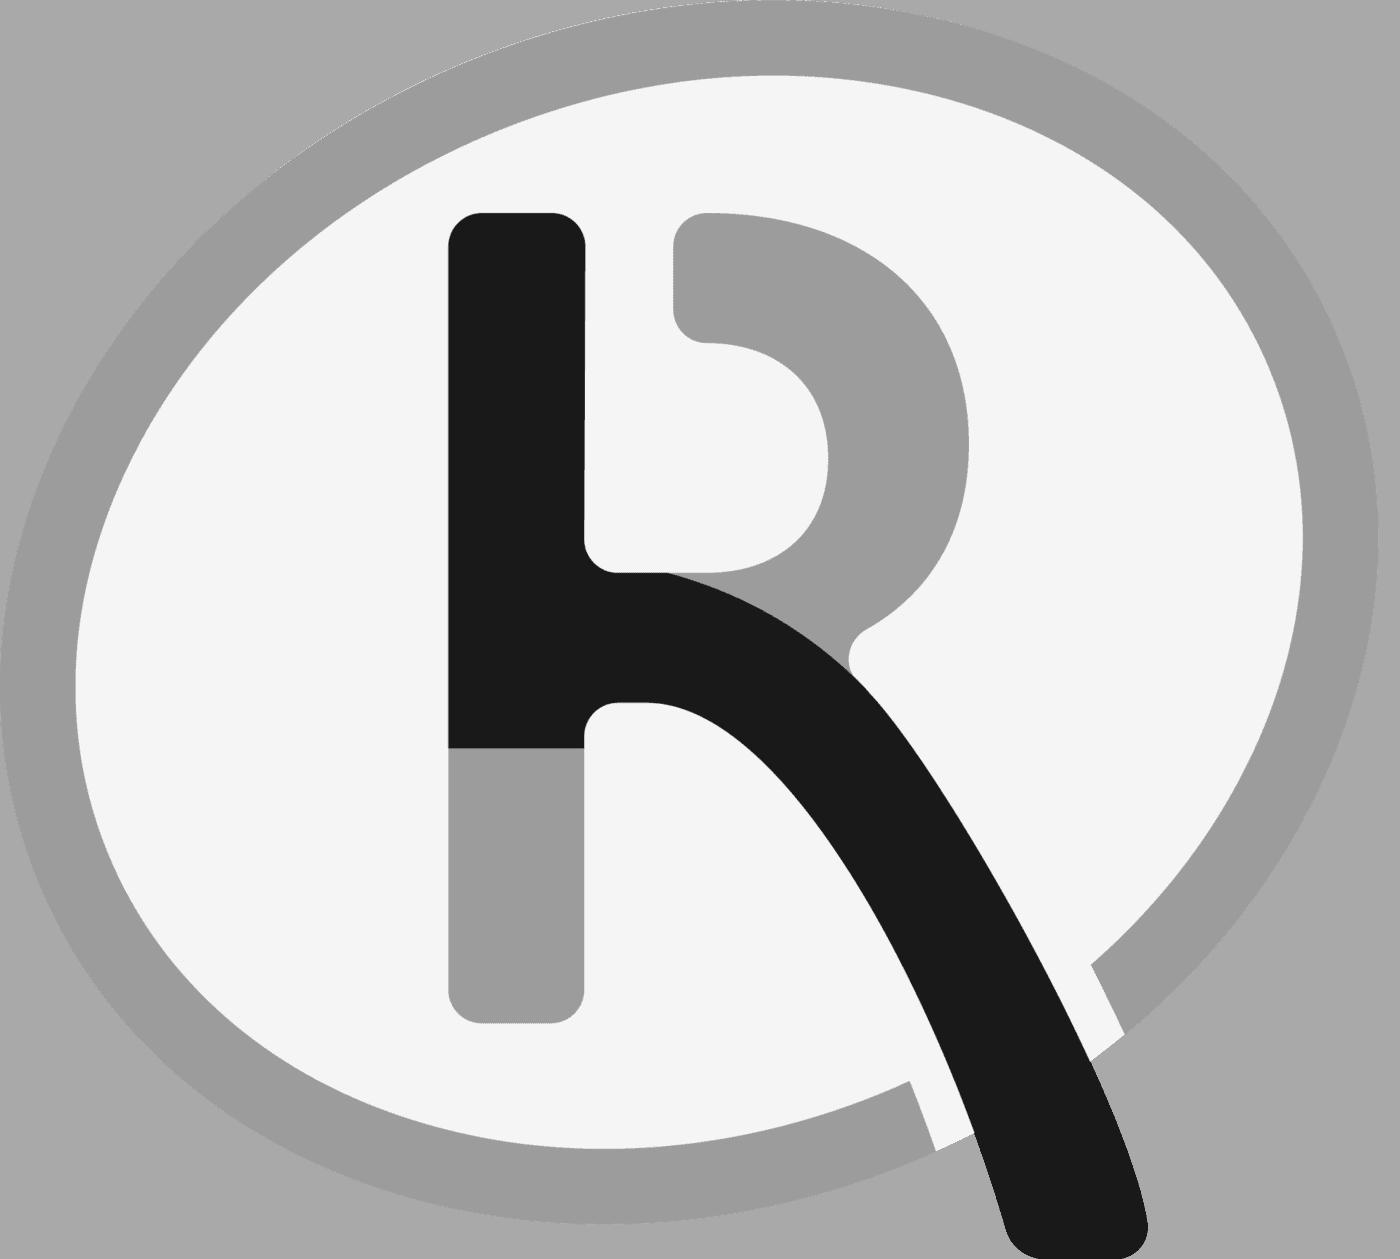 recombia brandmark grayscale